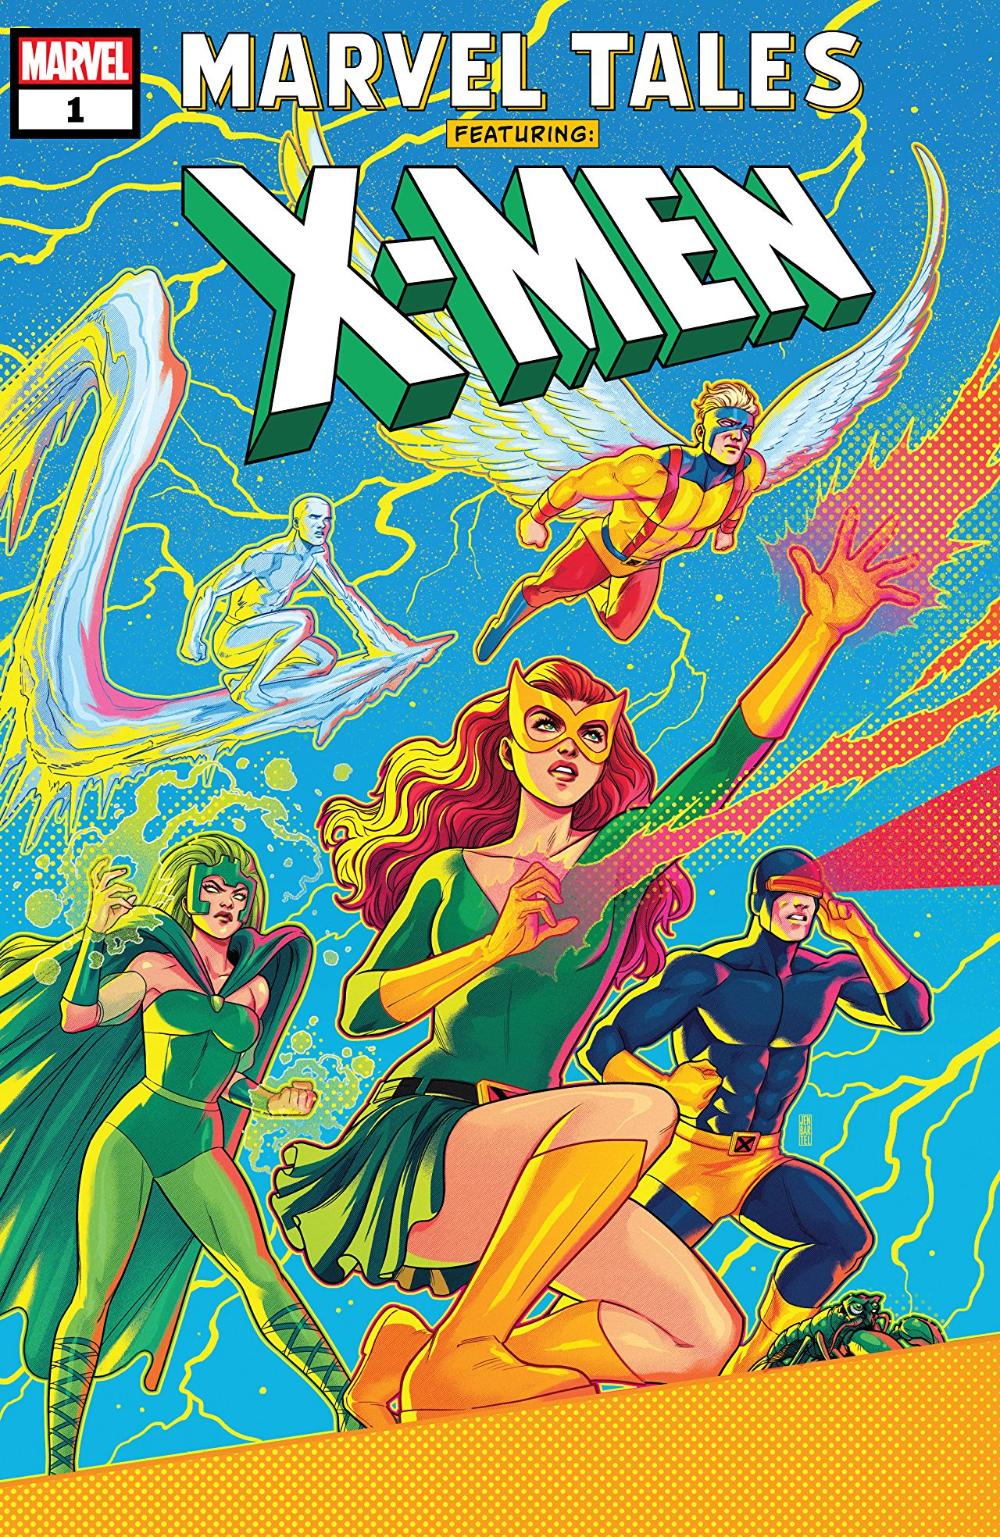 Marvel Tales X Men 2019 1 In 2020 X Men Marvel Comics